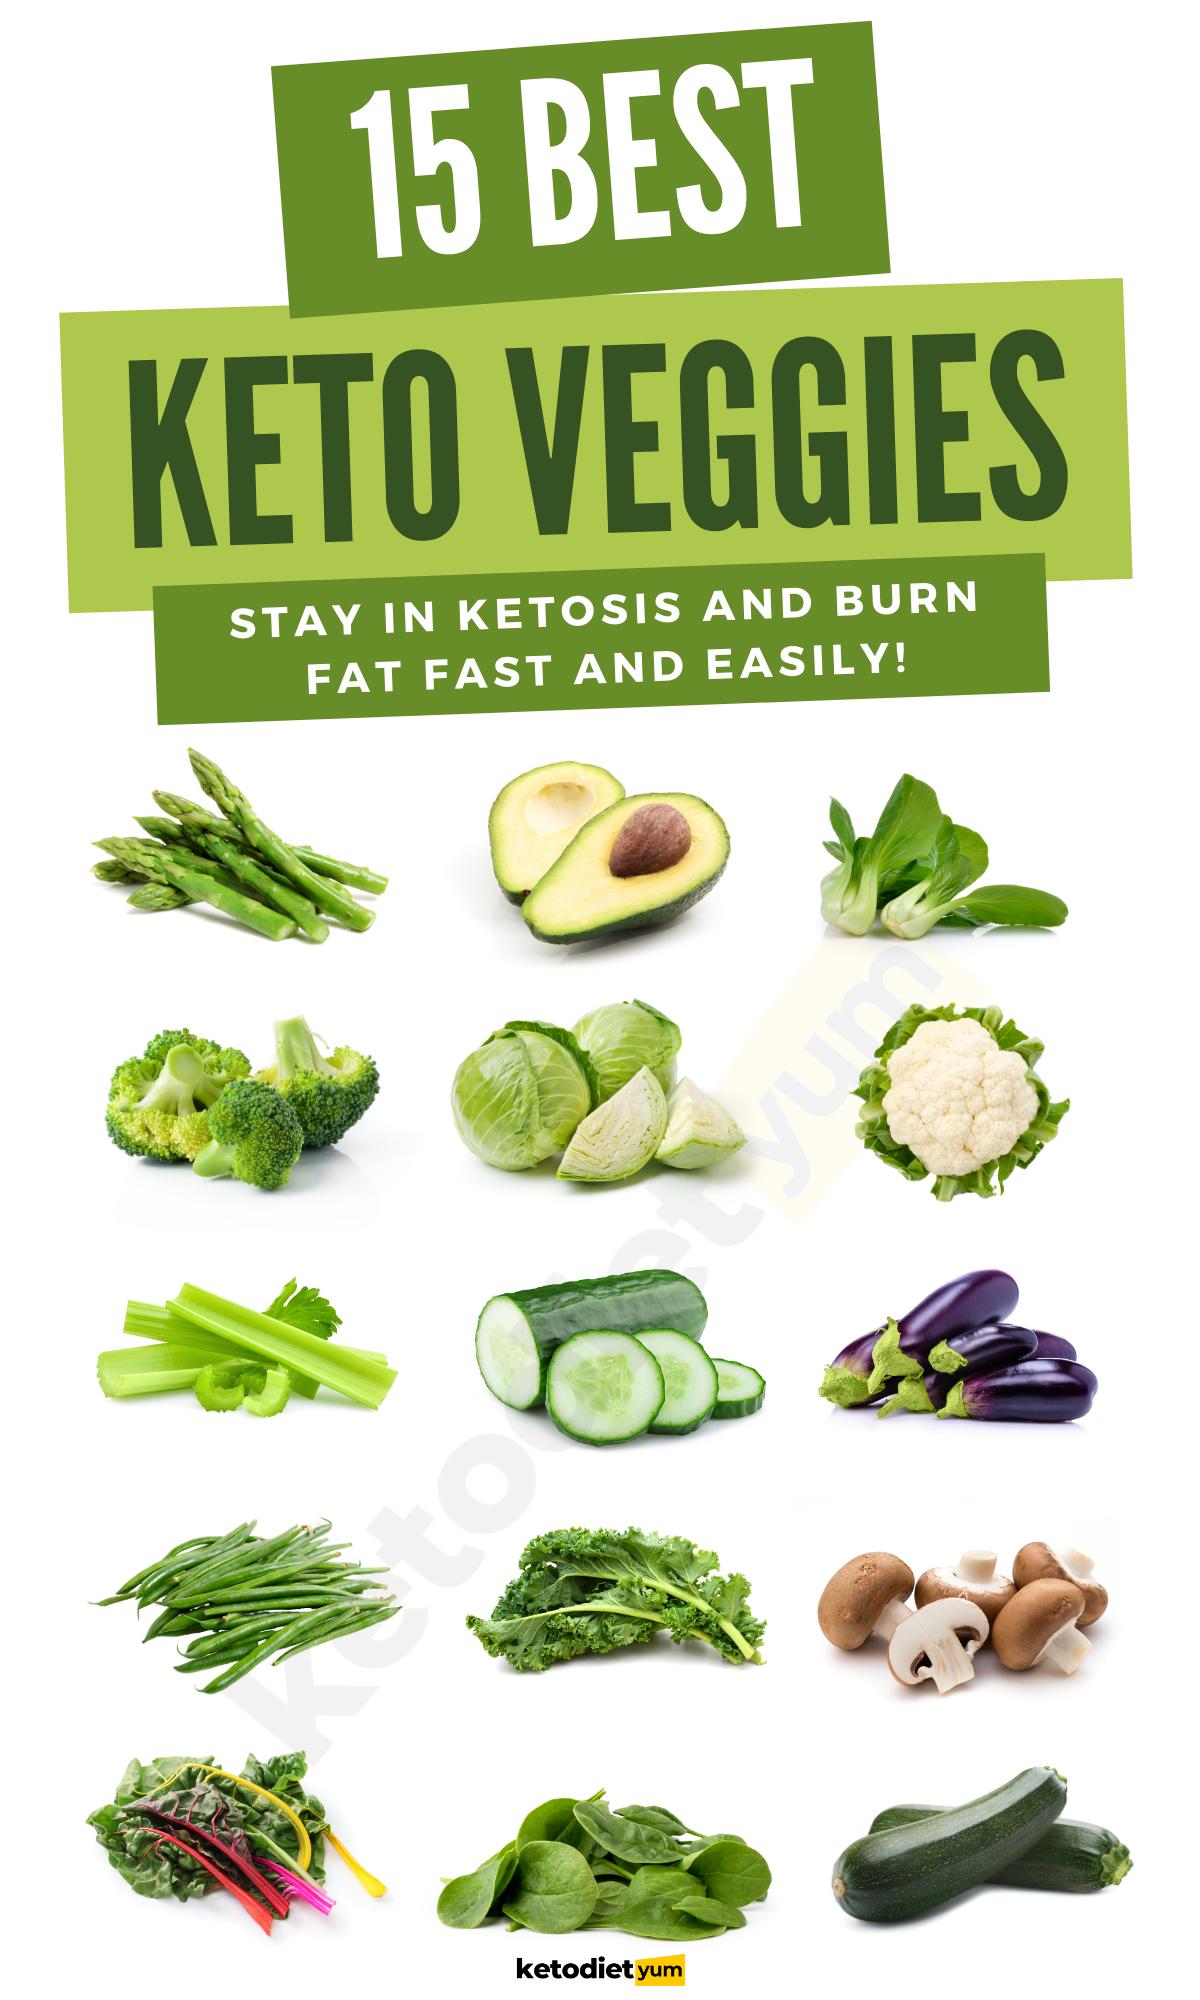 Keto Vegetables 15 Healthy And Nutritious Keto Friendly Vegetables Best Diet Foods Keto Friendly Vegetables Keto Veggie Recipes